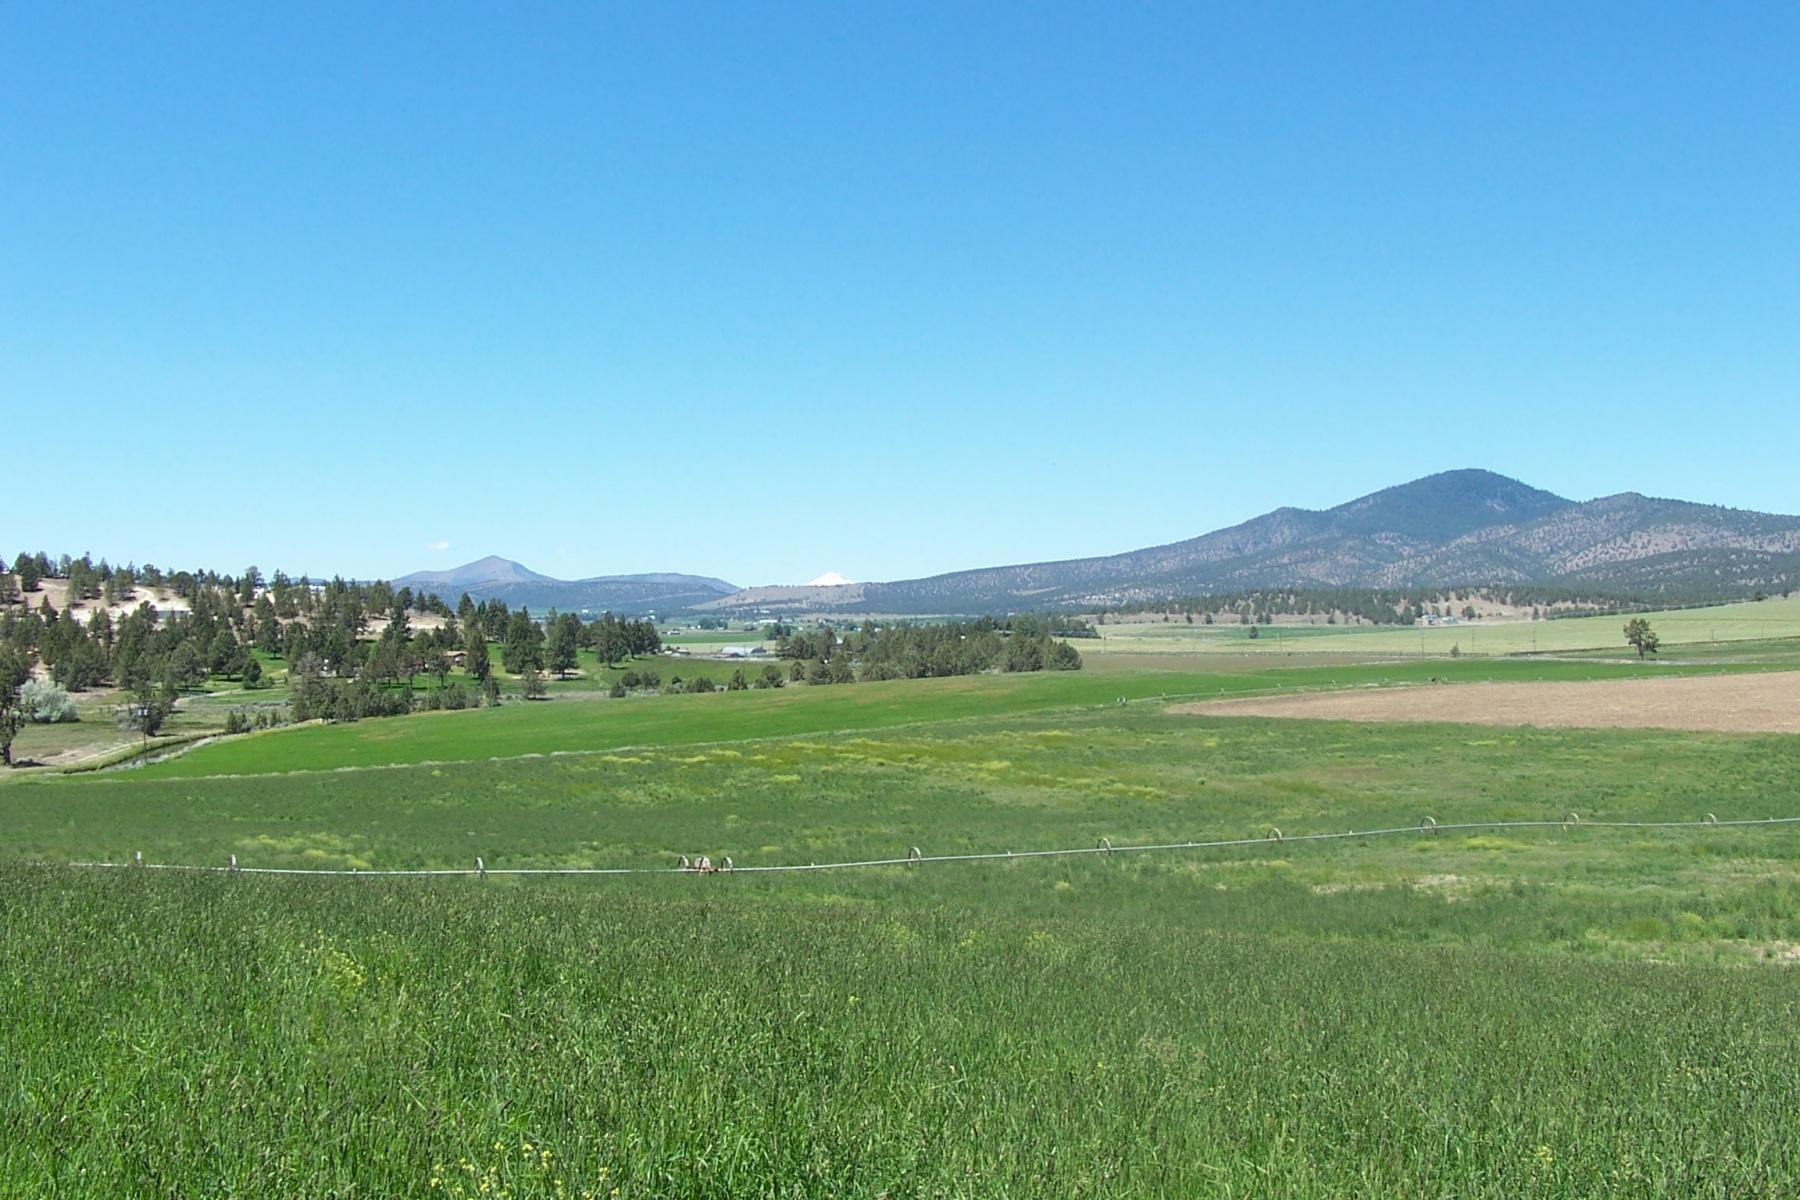 Ferme / Ranch / Plantation pour l Vente à 900 NW Gerke Road, PRINEVILLE 900 NW Gerke Rd Prineville, Oregon, 97754 États-Unis